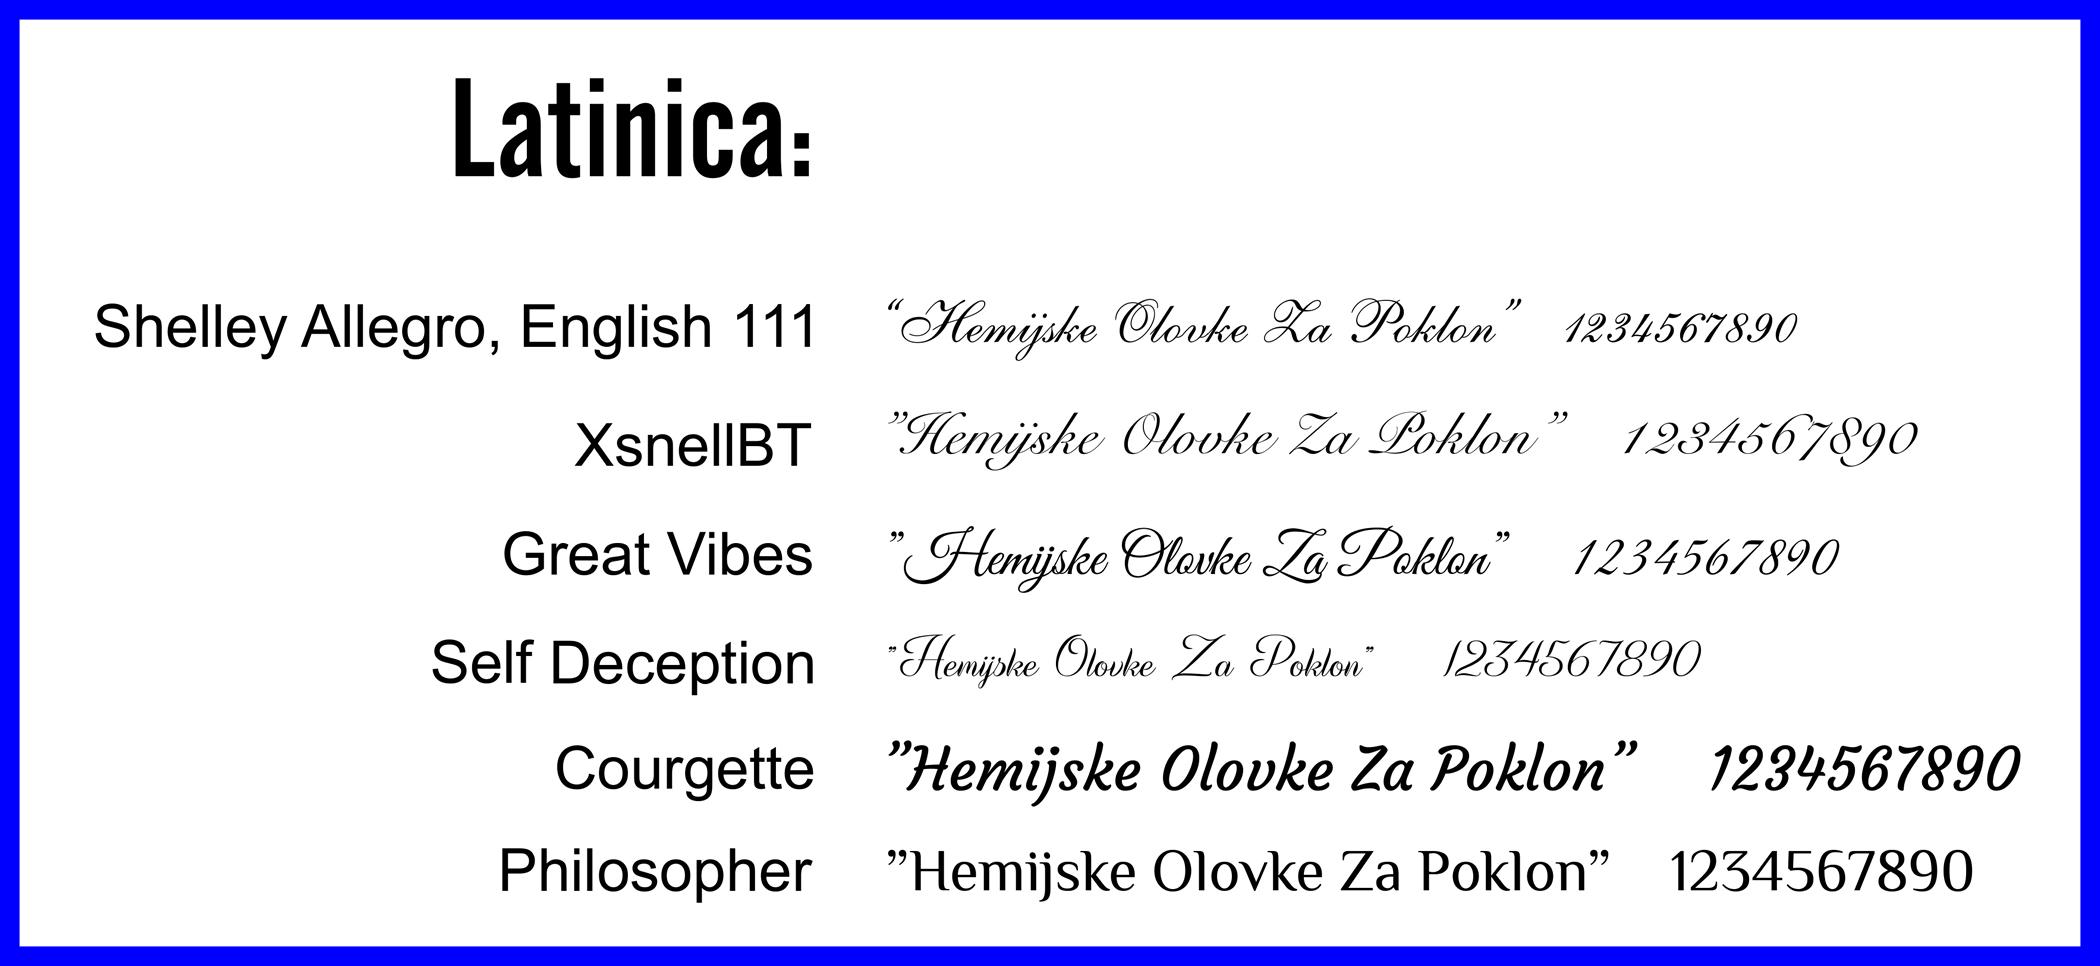 Pisana-latinica